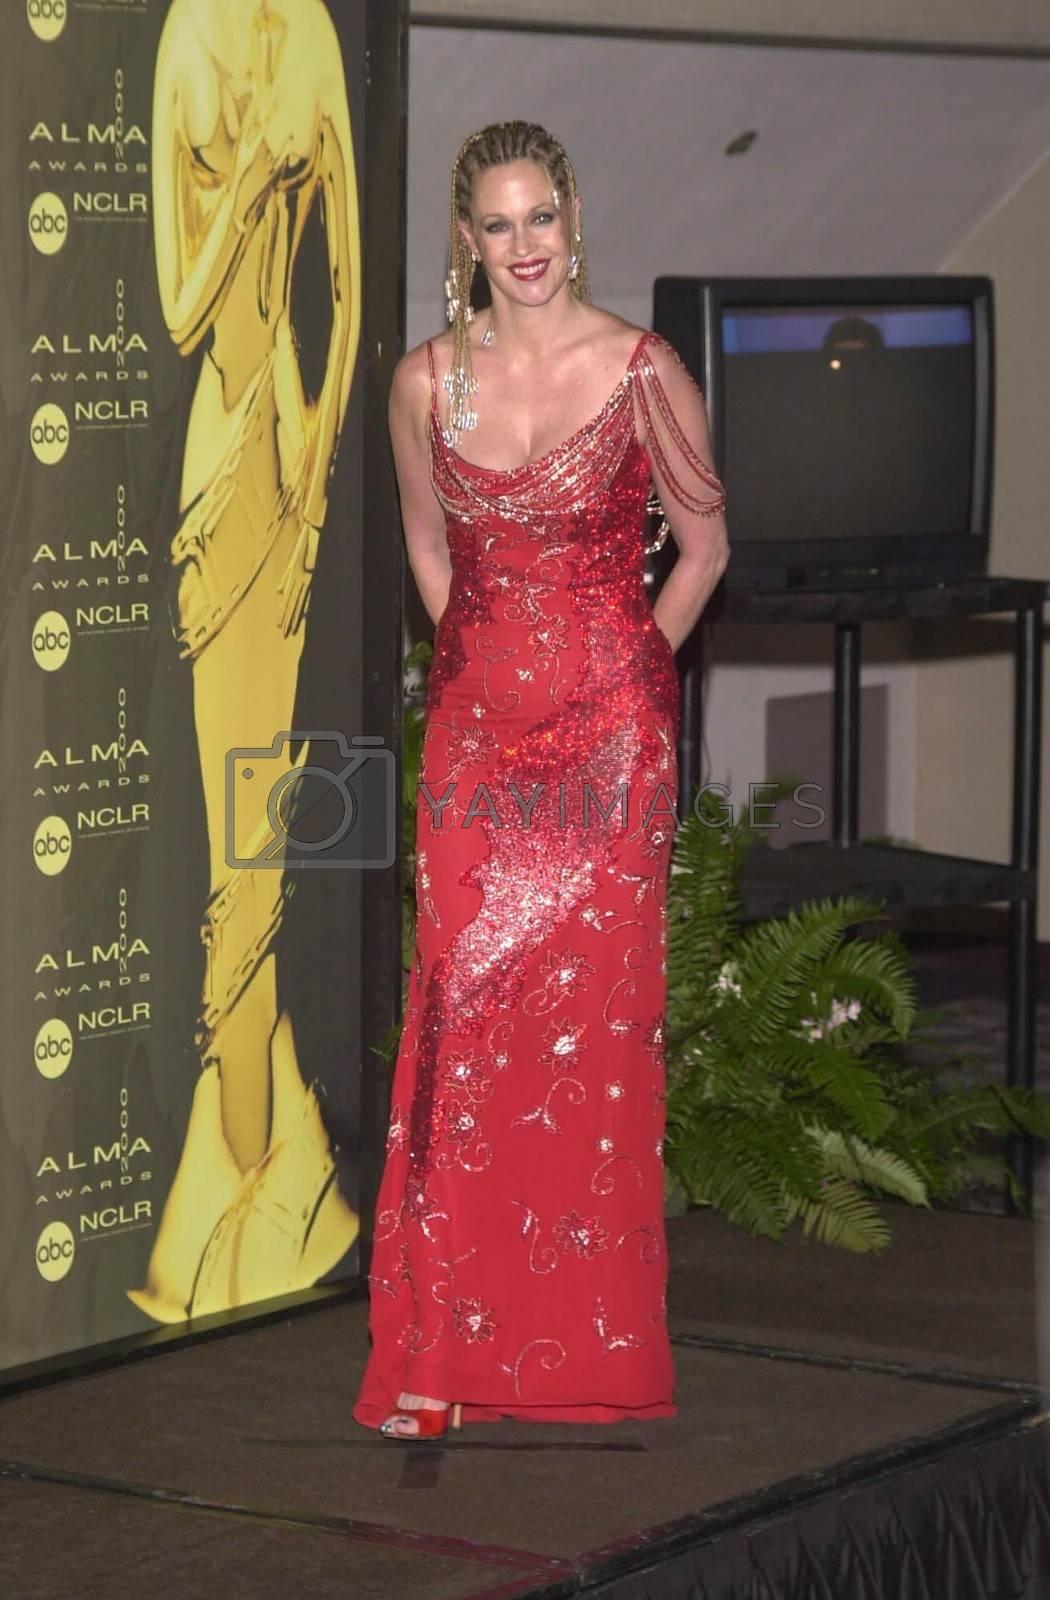 Melanie Griffith at the 2000 Alma Awards, in Pasadena, 04-16-00